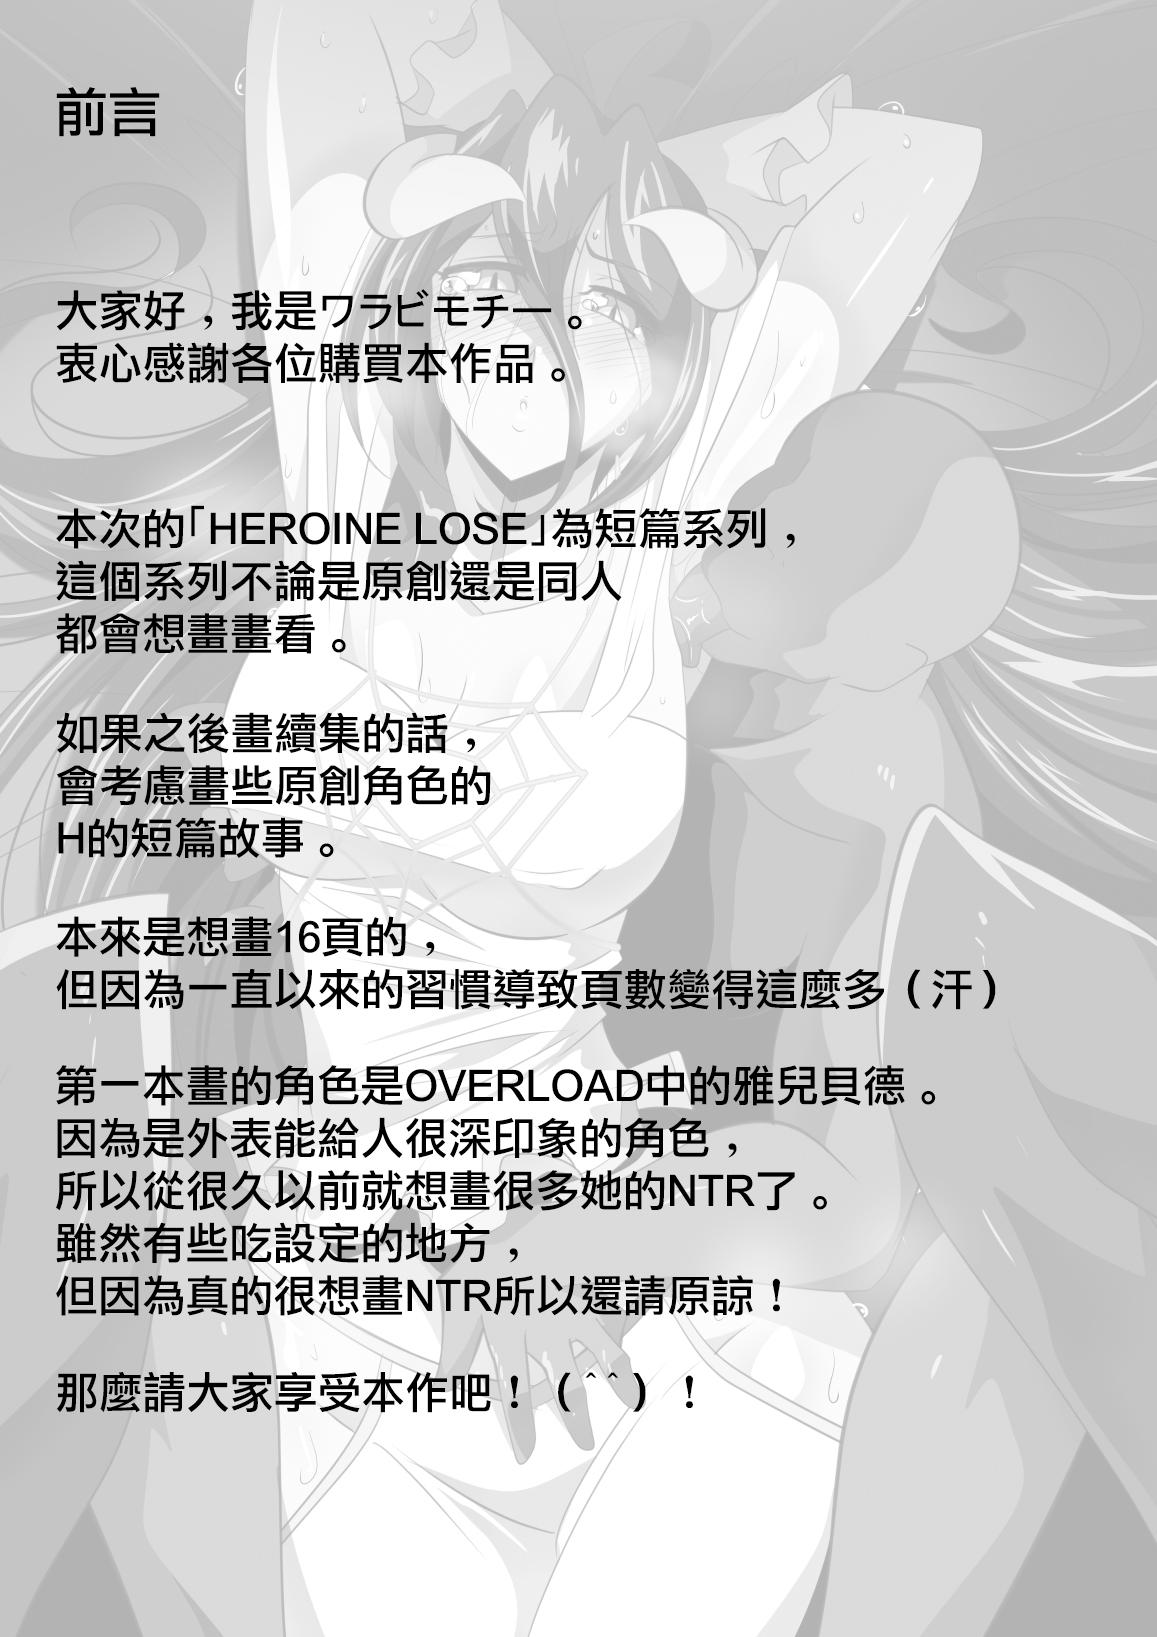 HEROINE LOSE Albedo Hen 2